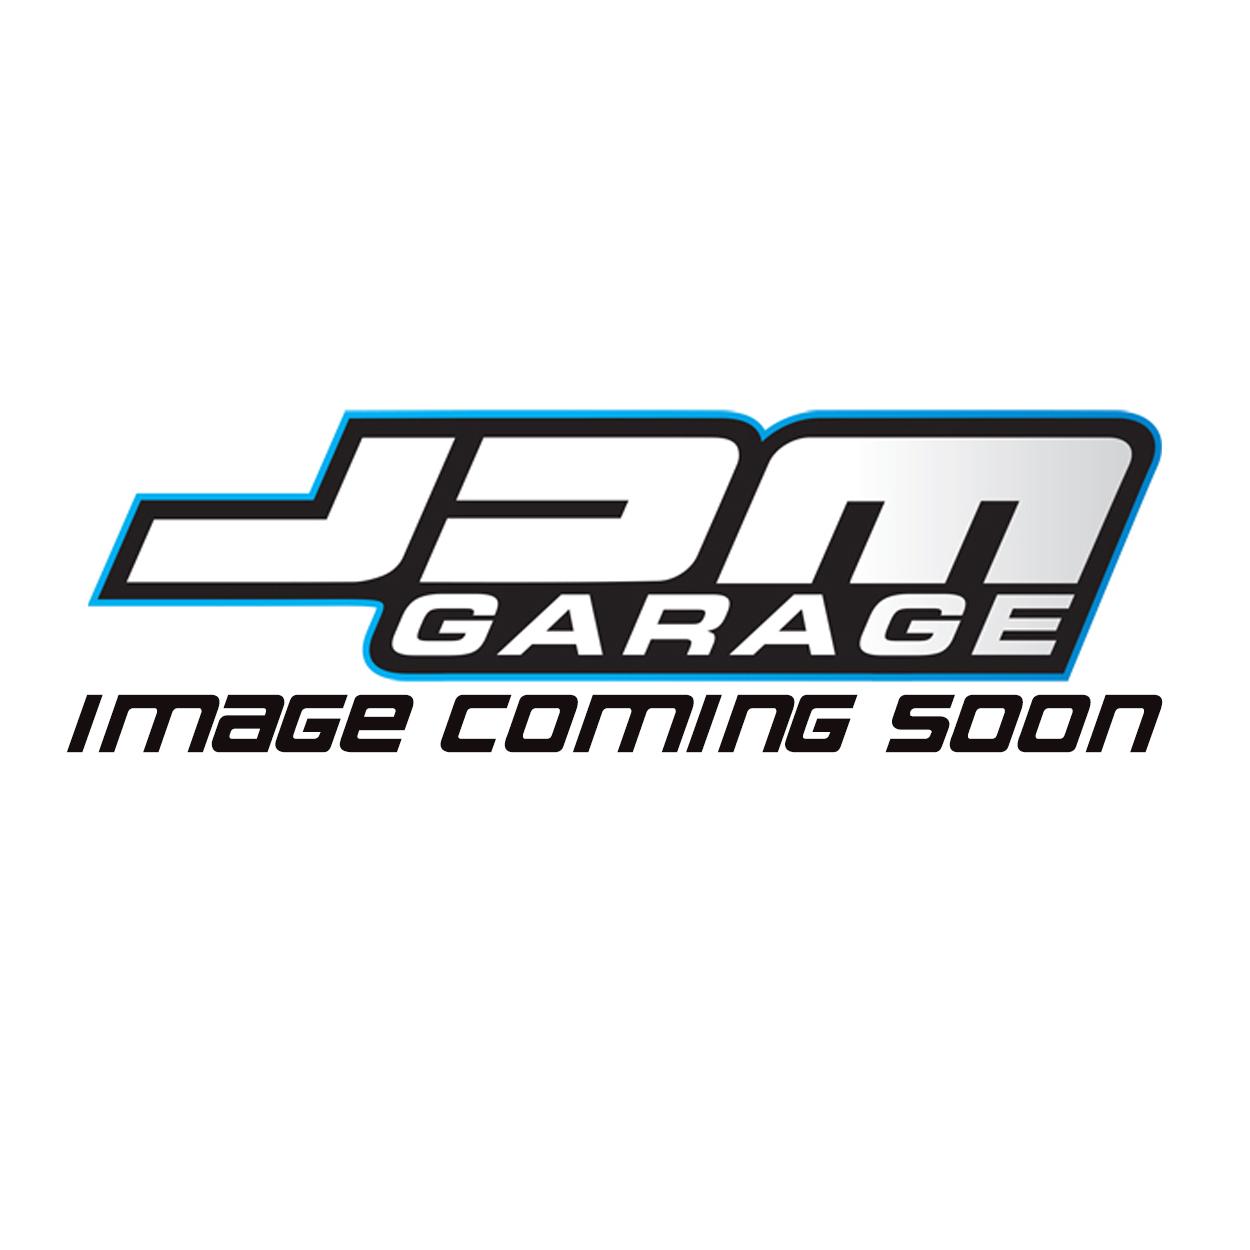 OE Replacement & EBC GD Series Rear Brake Discs - Mazda MX5 Mk1 NA 90-98